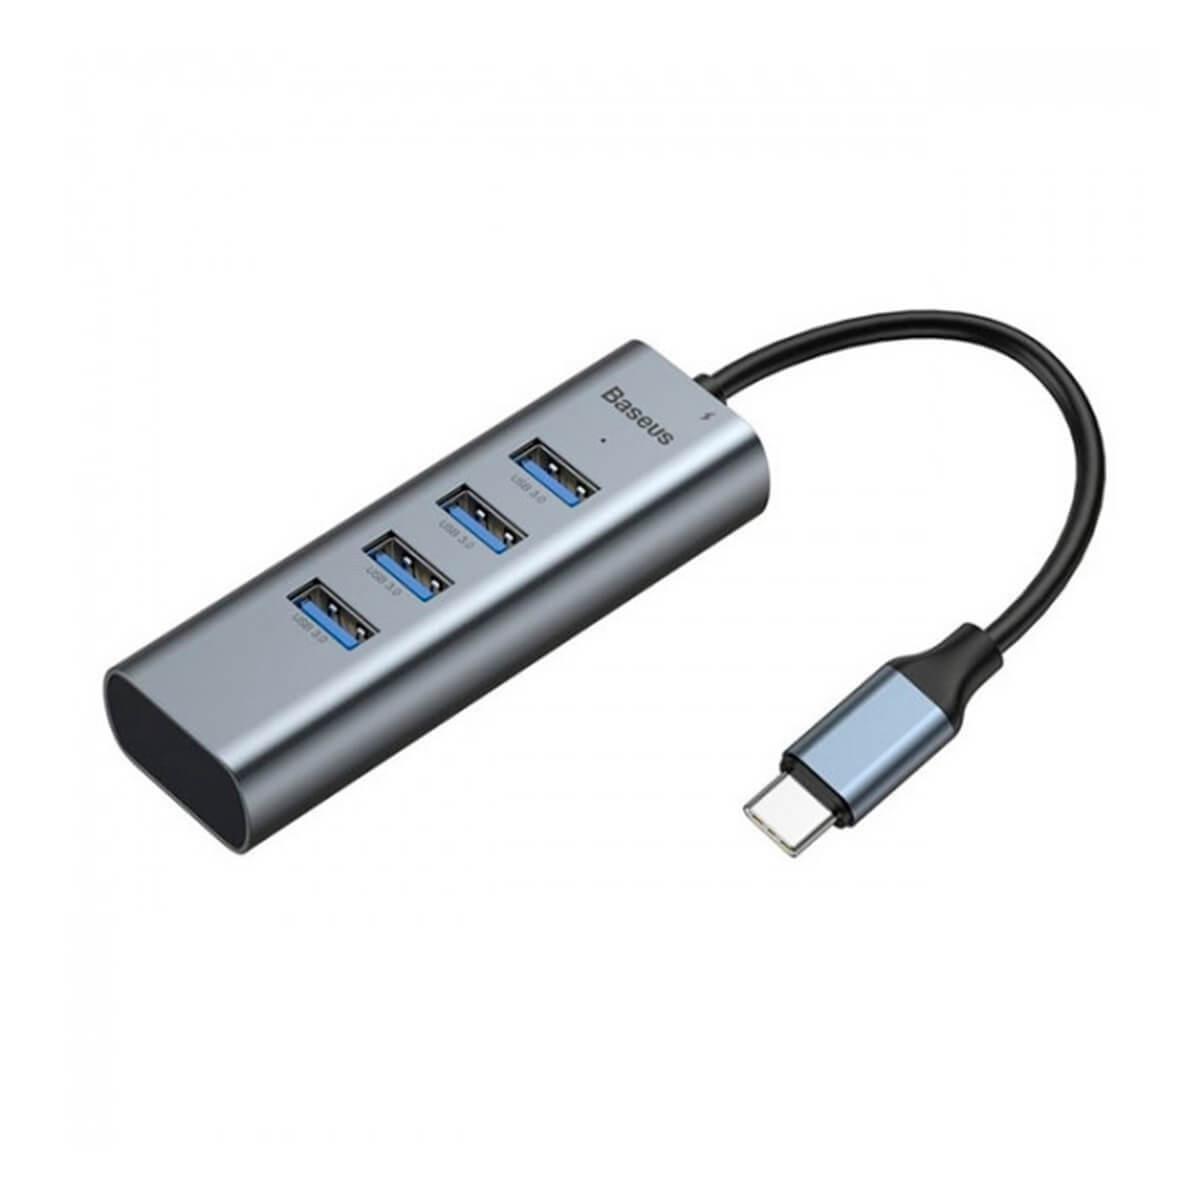 Мультиадаптер Baseus Enjoy series Type-C to USB3.0*4+HD4K HD intelligent HUB adapter Grey (CAHUB-N0G)